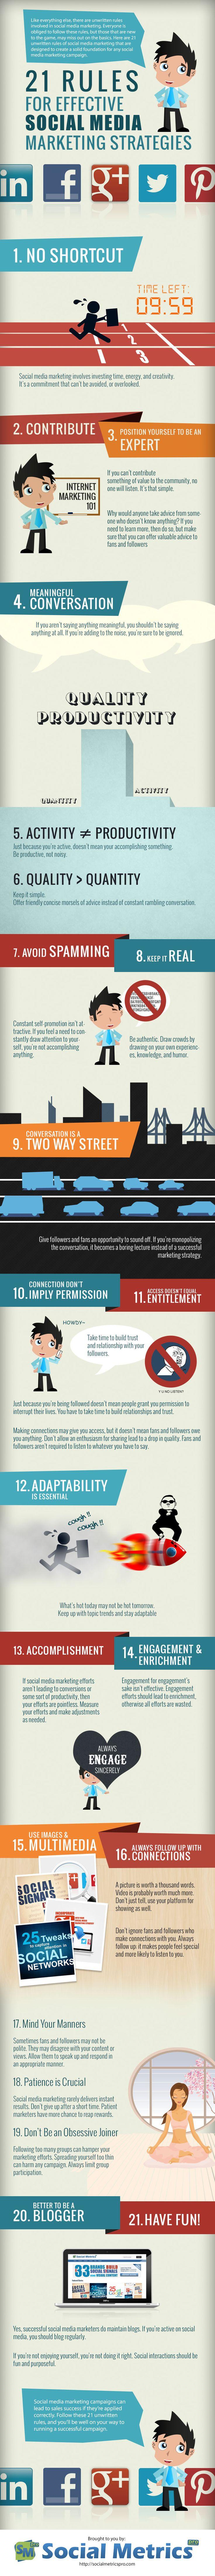 21 Rules For Effective Social Media Marketing Strategies - Social Metrics | #TheMarketingAutomationAlert